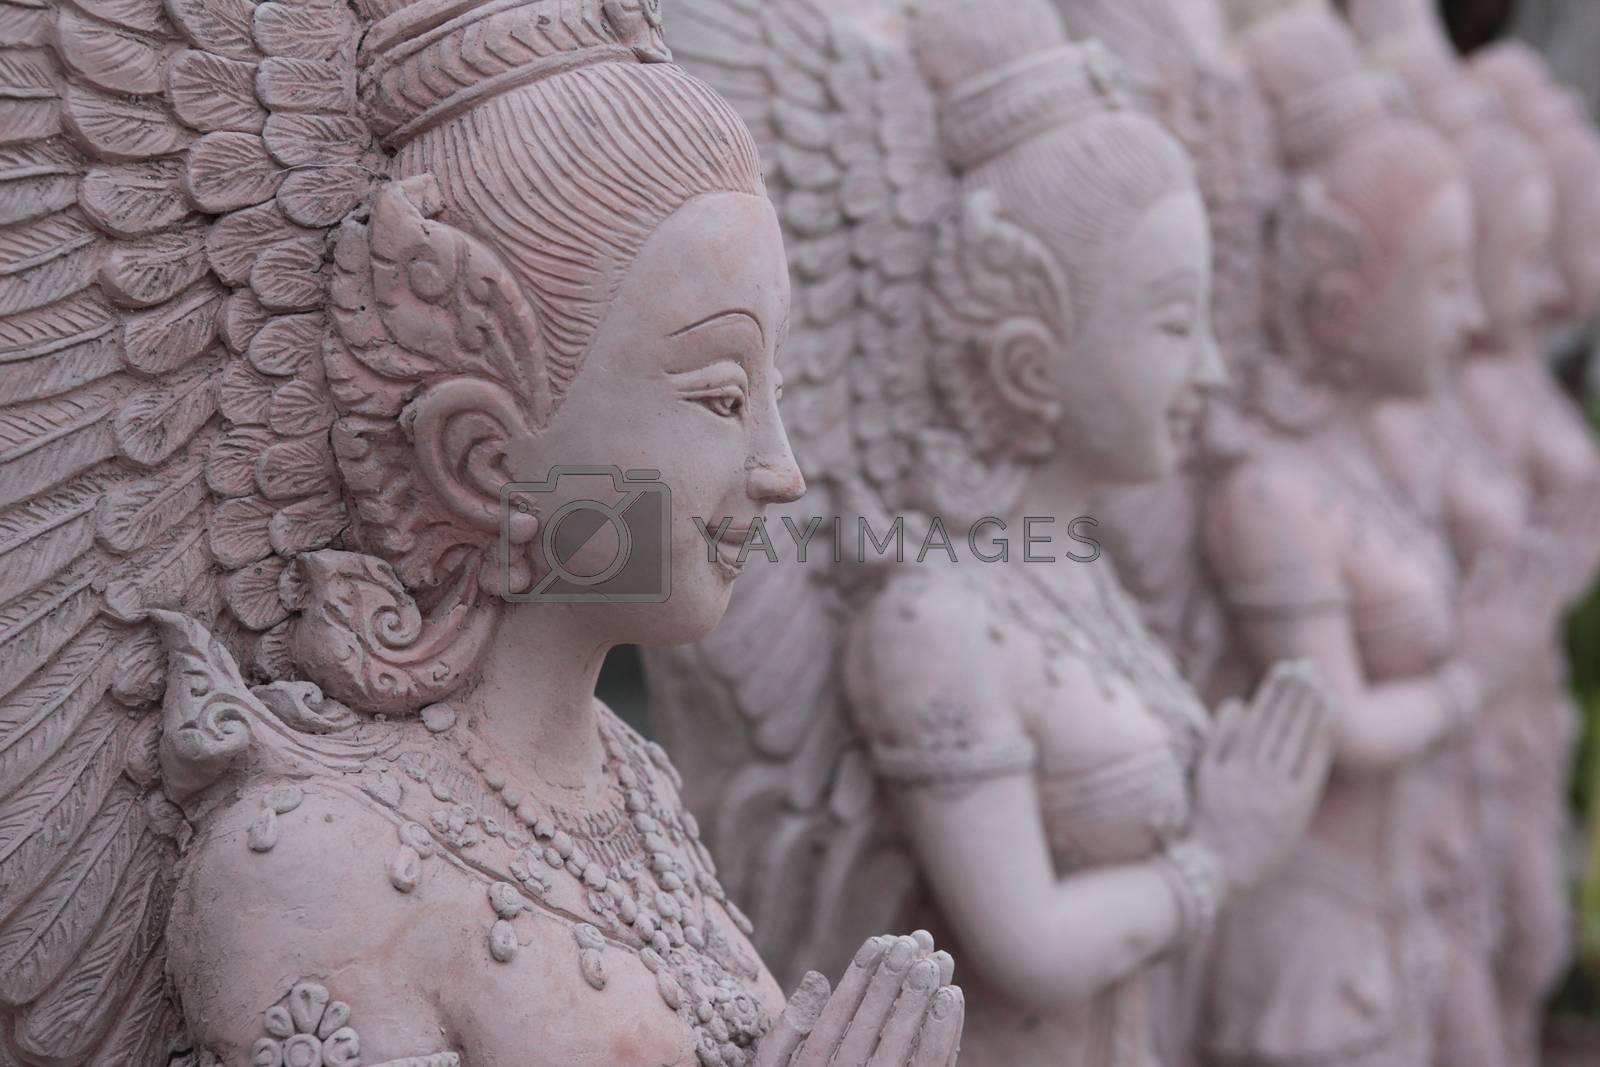 ASIA THAILAND ISAN KHORAT SKULPTURE FACTORY by urf